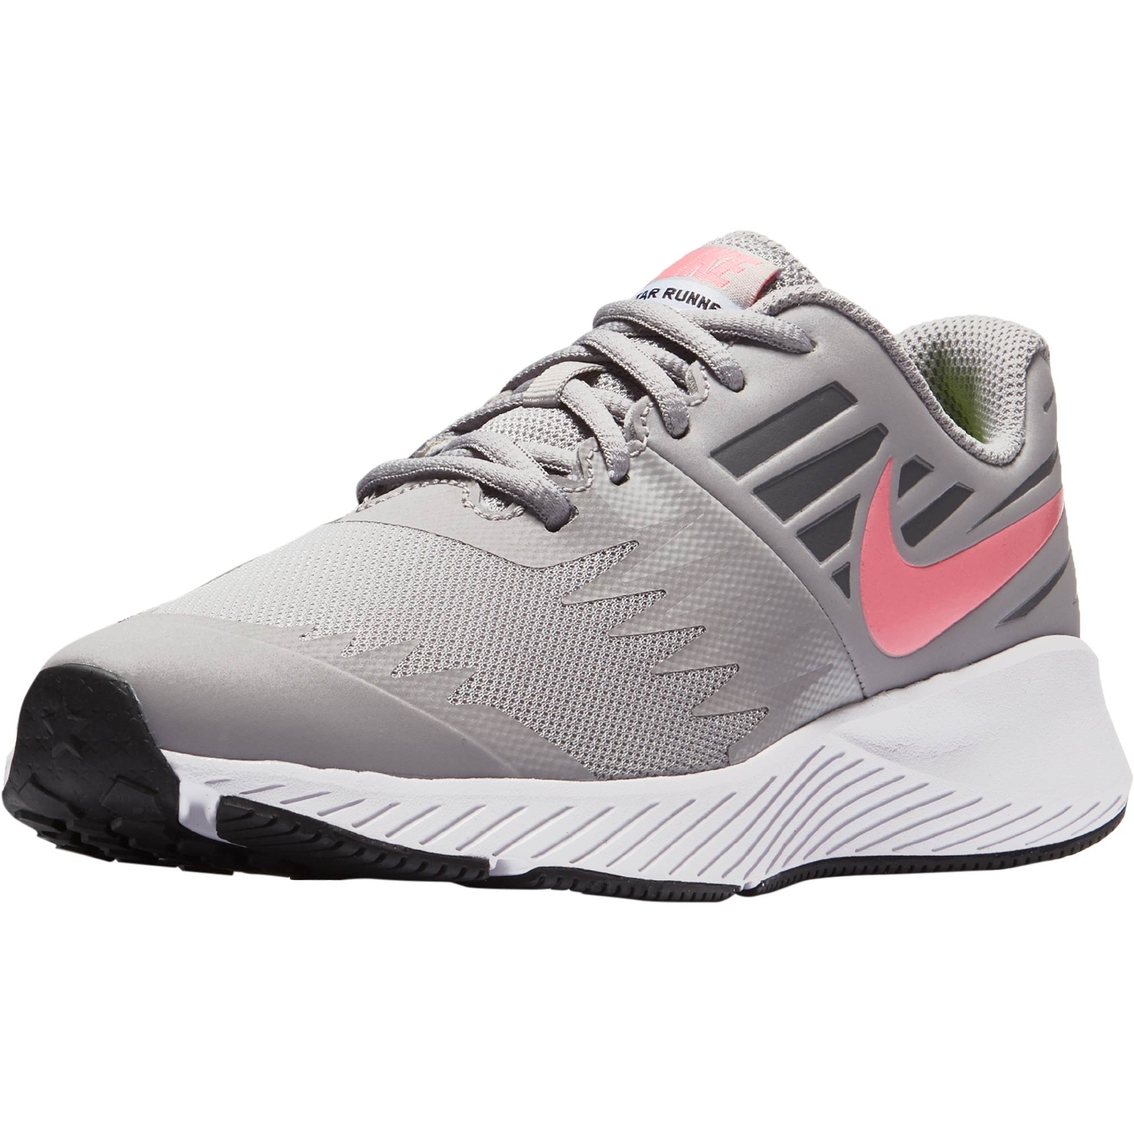 9213f261014b72 Nike Grade School Girls Star Runner Running Shoes